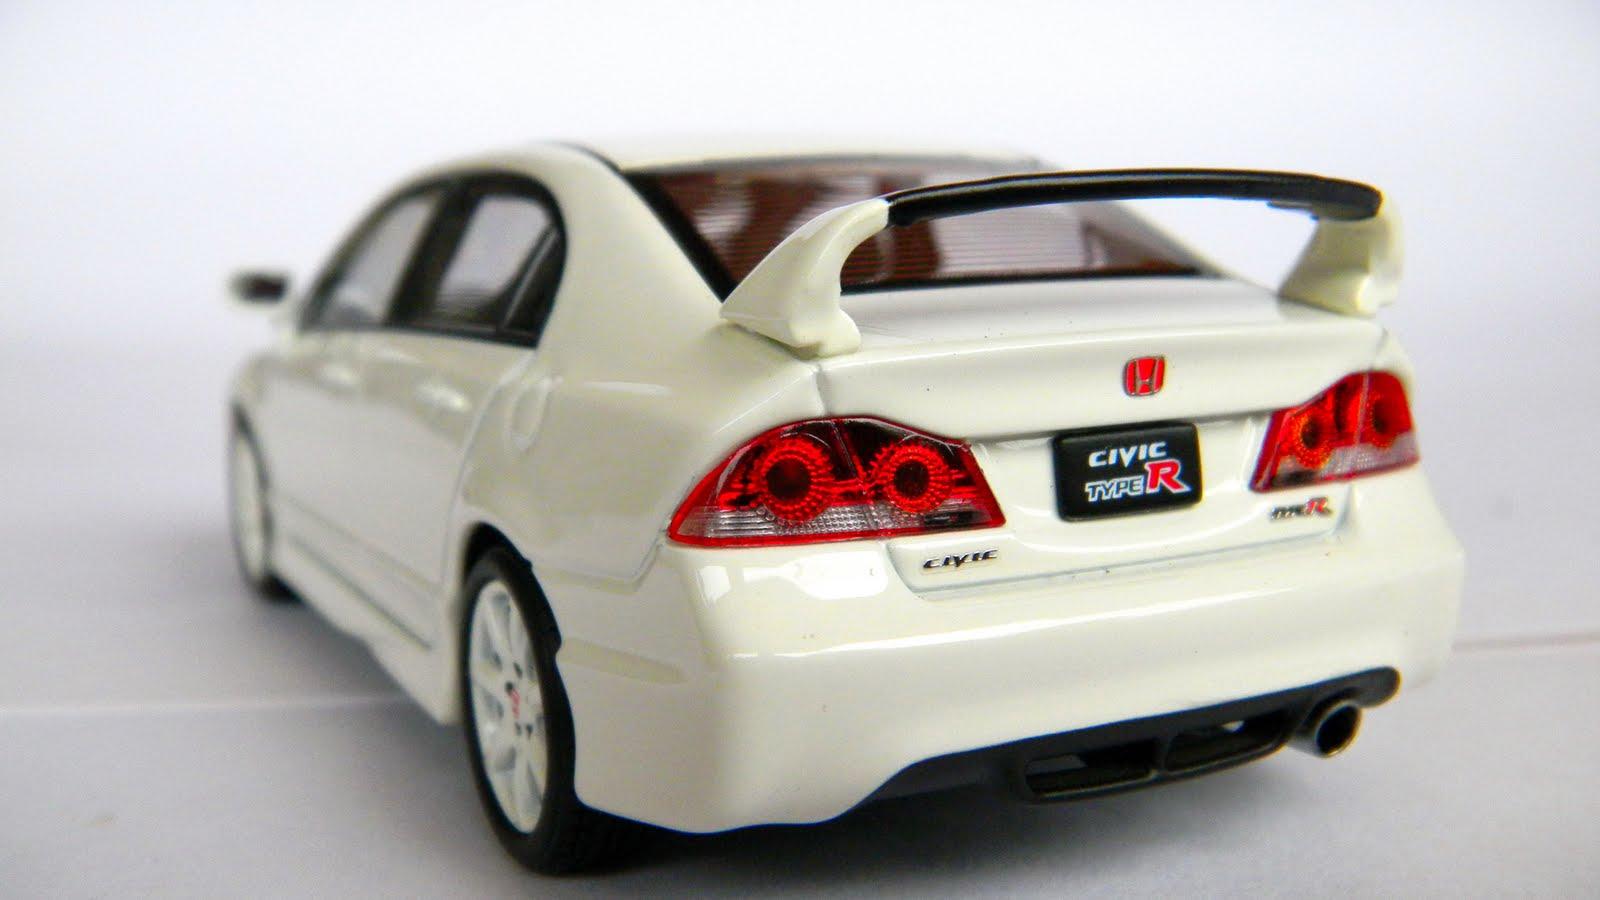 118 models honda civic type r japan 2007 for Honda civic 2010 model